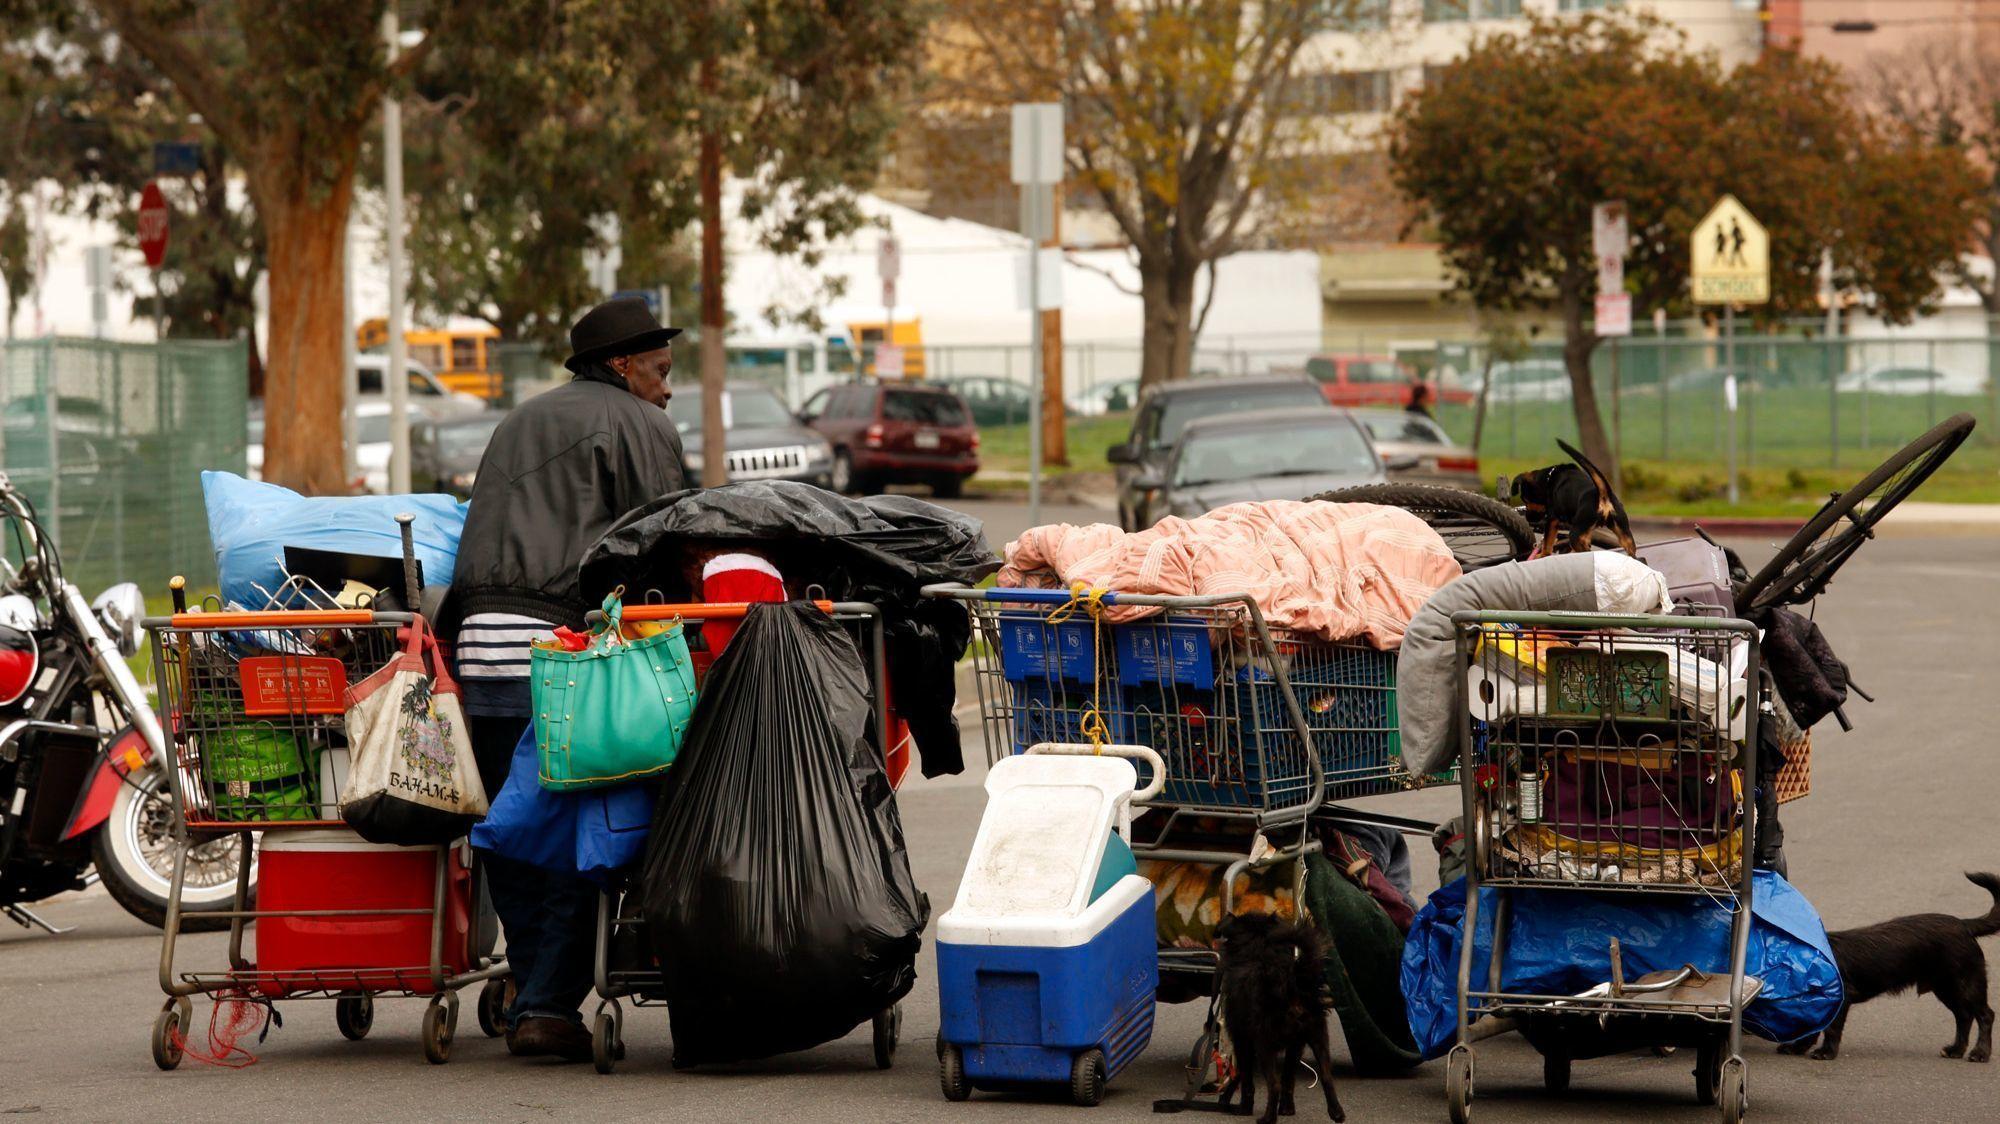 City Of Los Angeles Housing Complaints